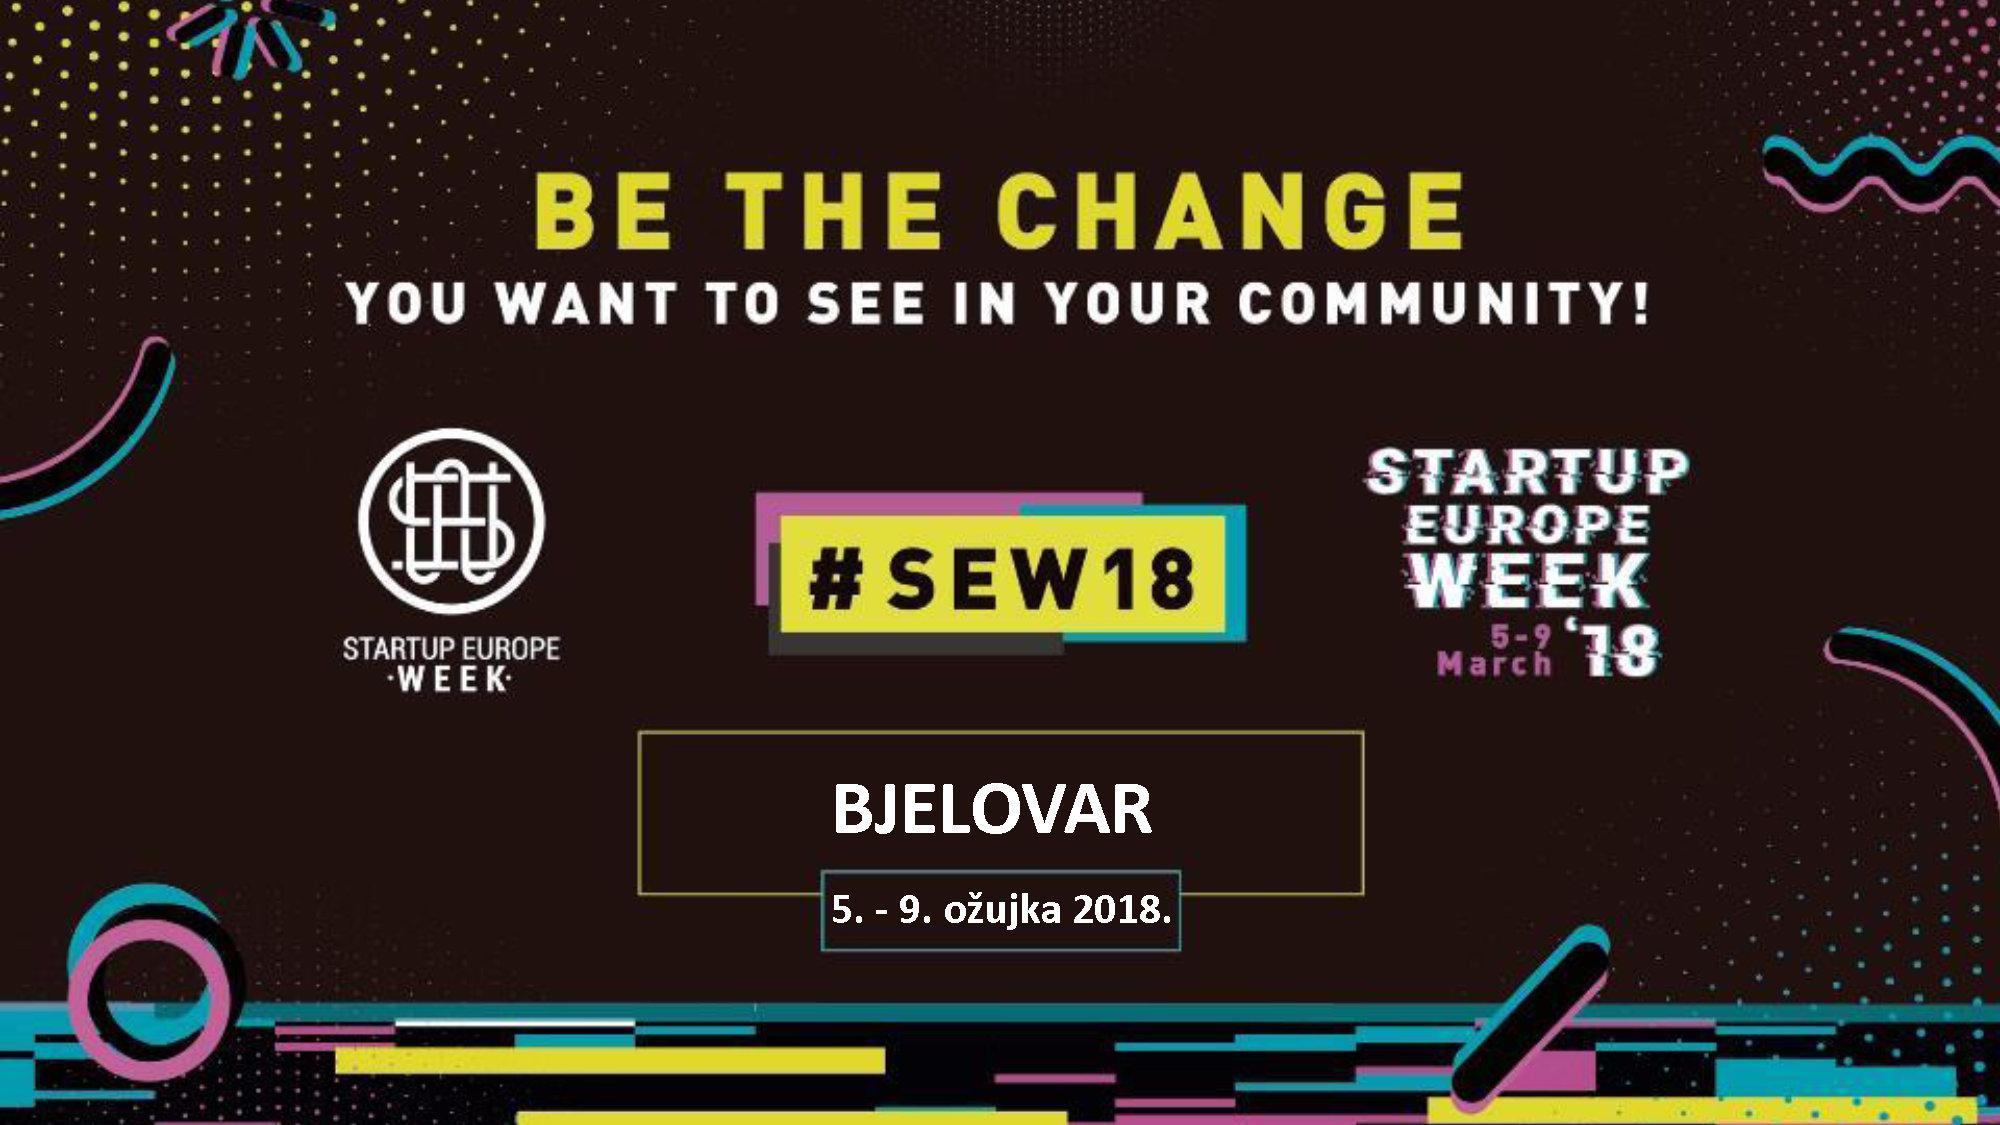 Startup Europe Week - Bjelovar, 5. - 9. ožujka 2018.